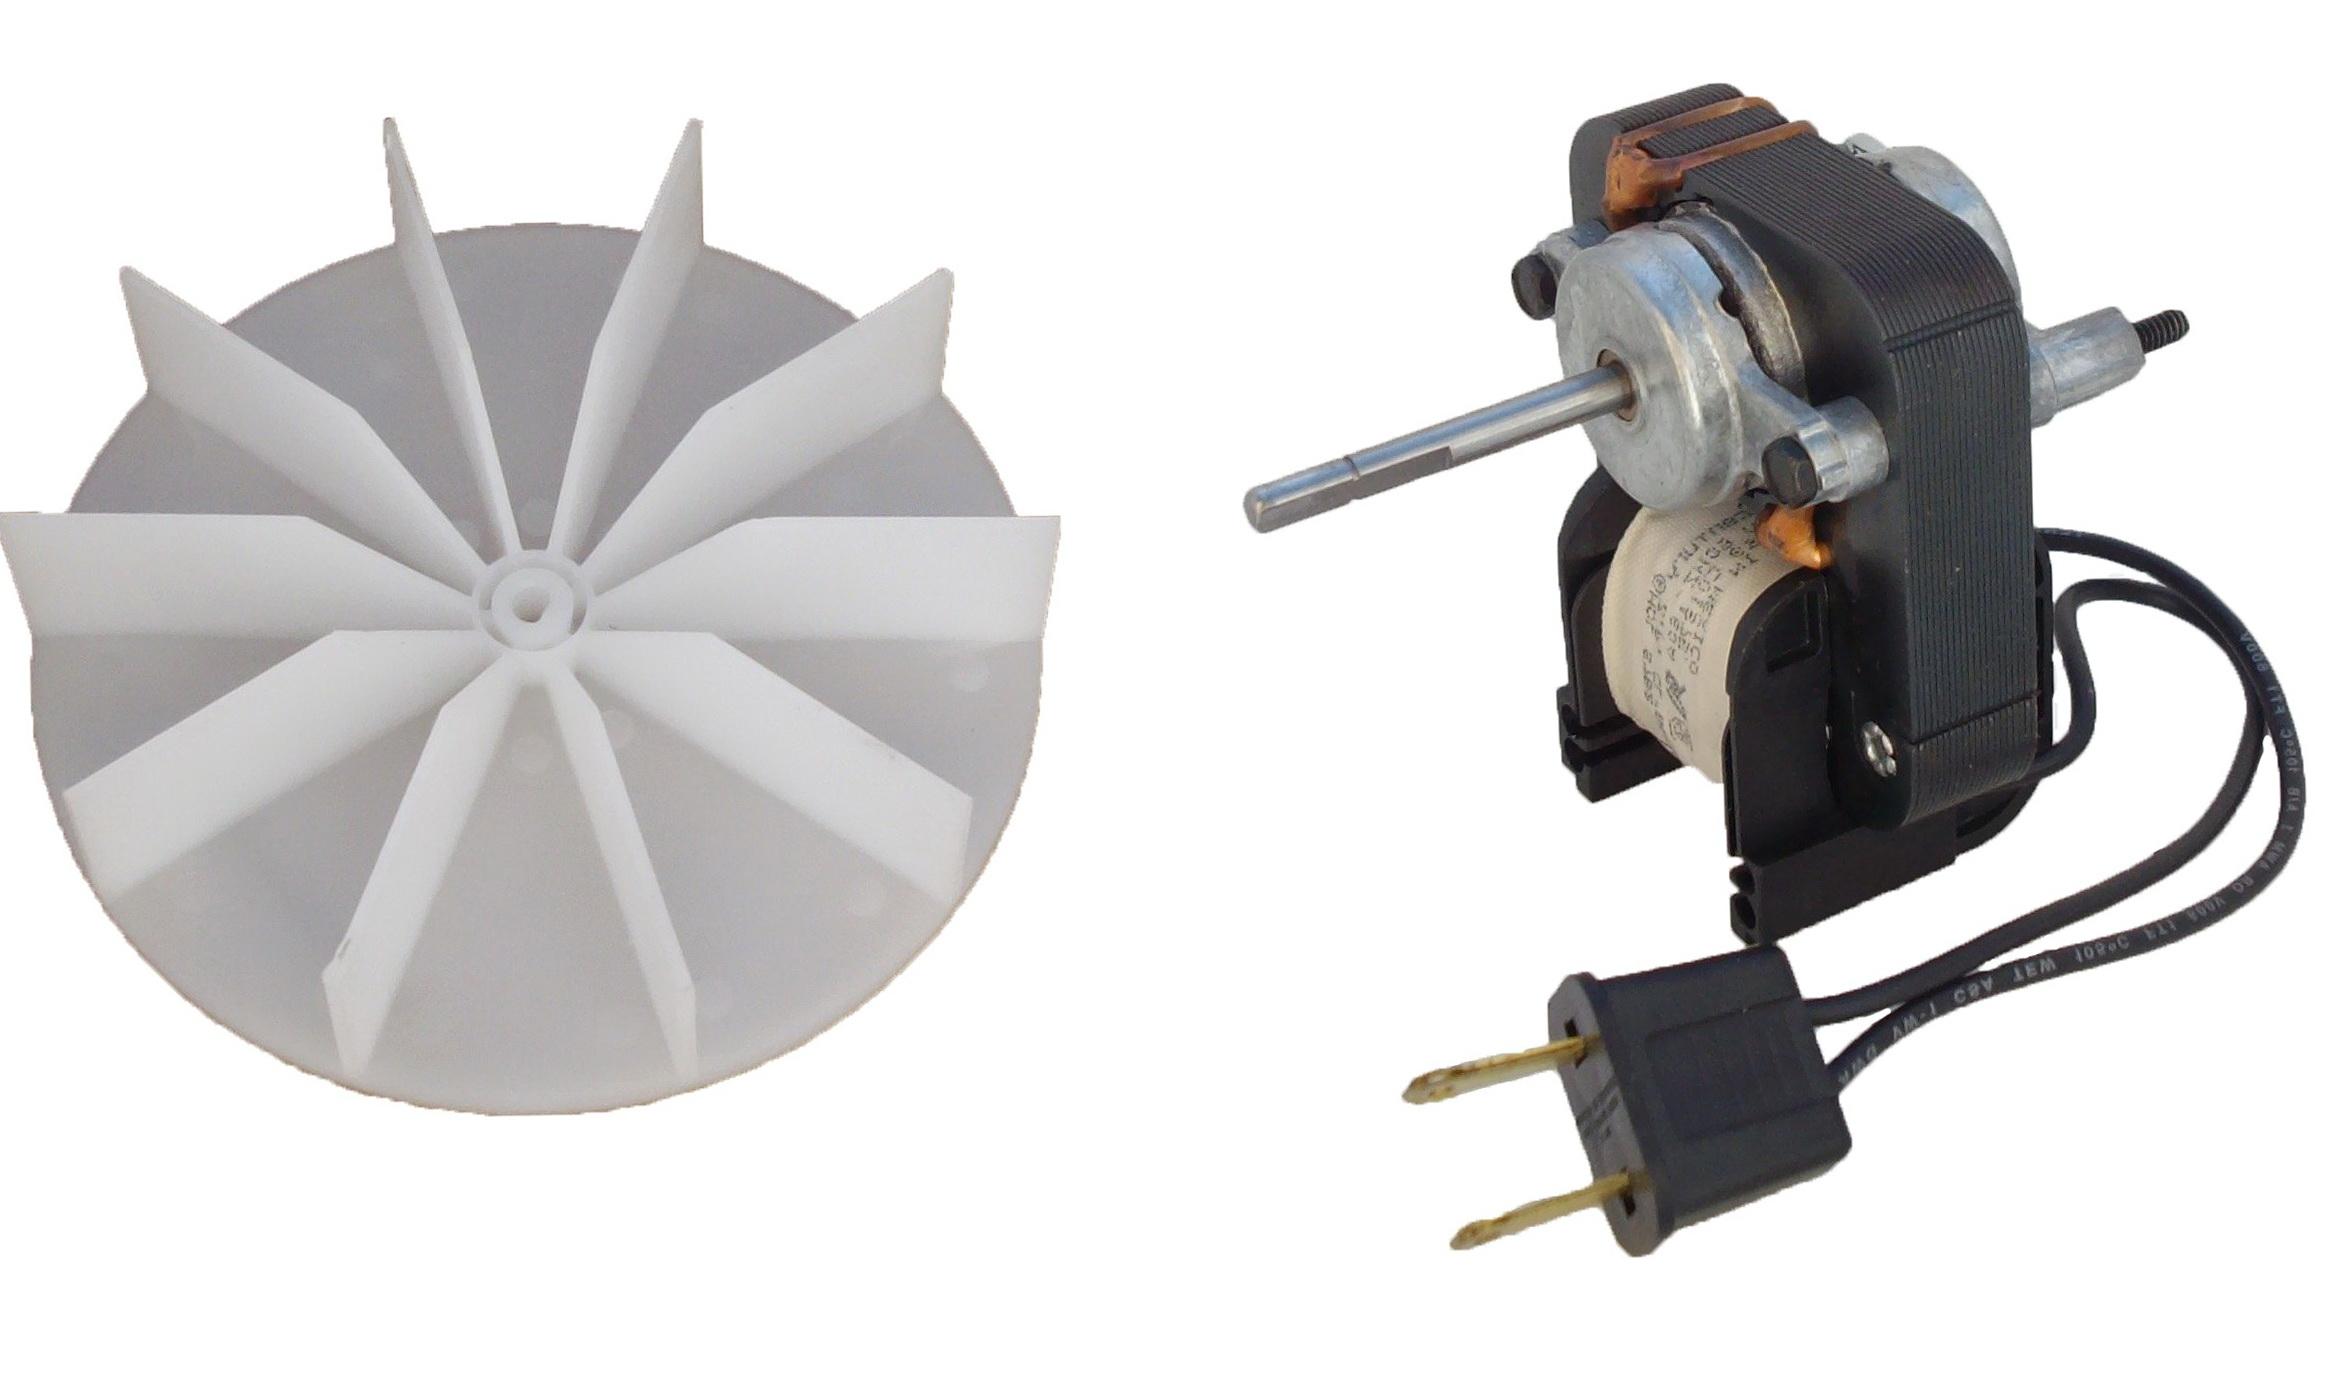 Nutone Bathroom Fan Replacement